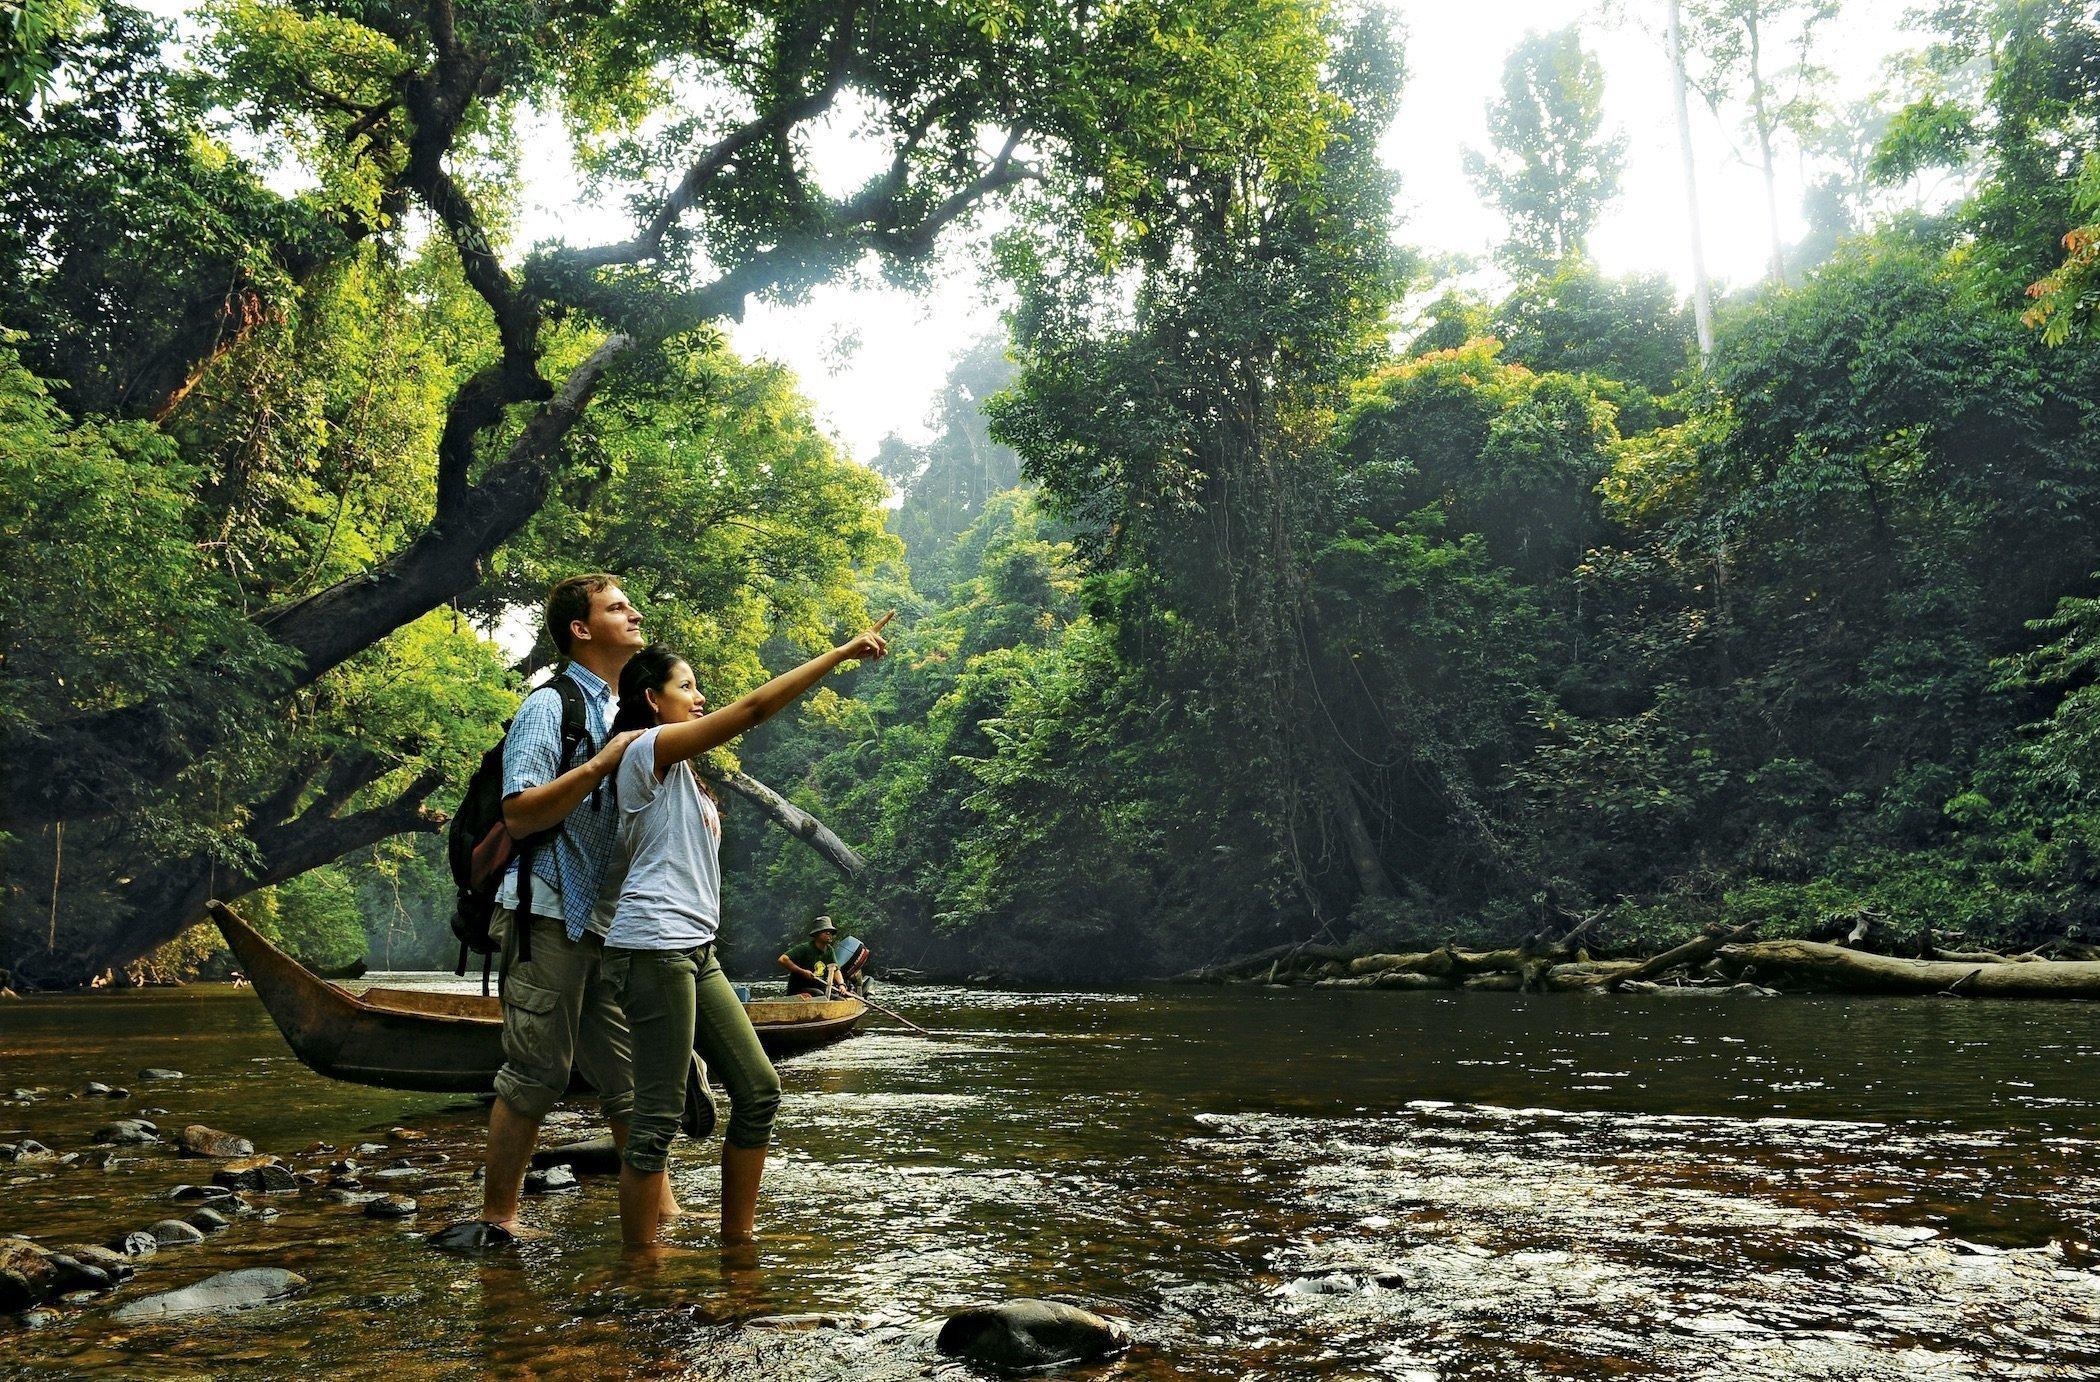 A couple of tourists admiring the rainforest in Taman Negara Malaysia